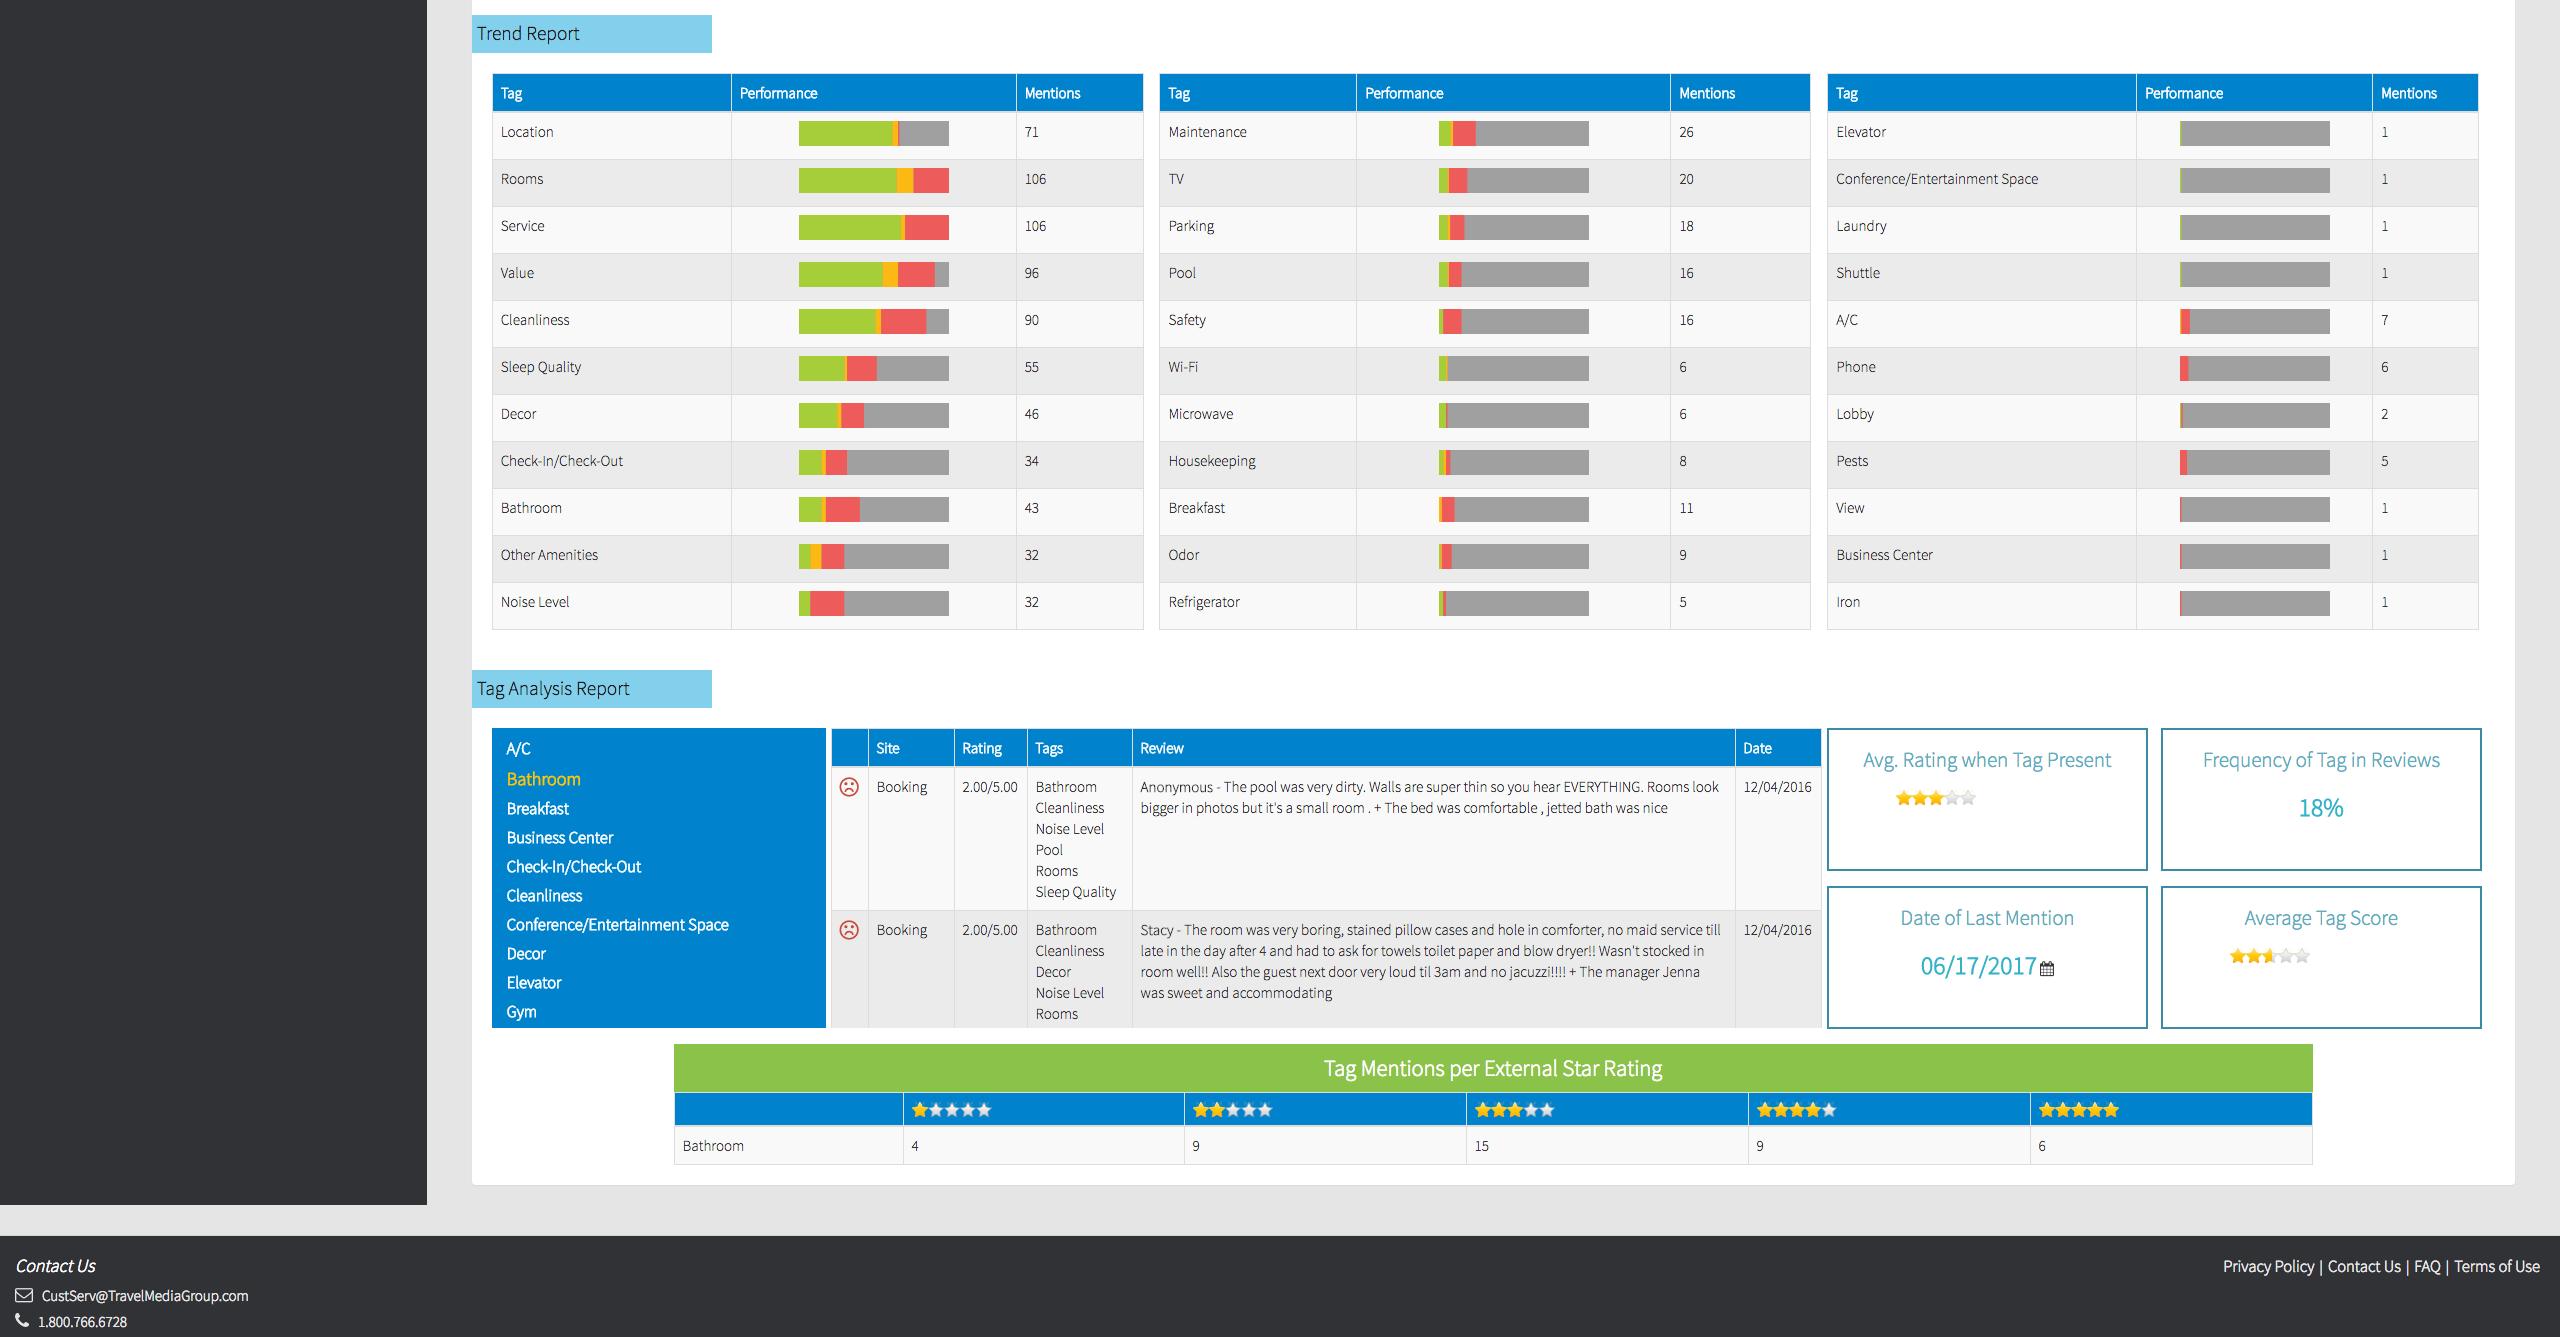 Sentiment Analysis Report